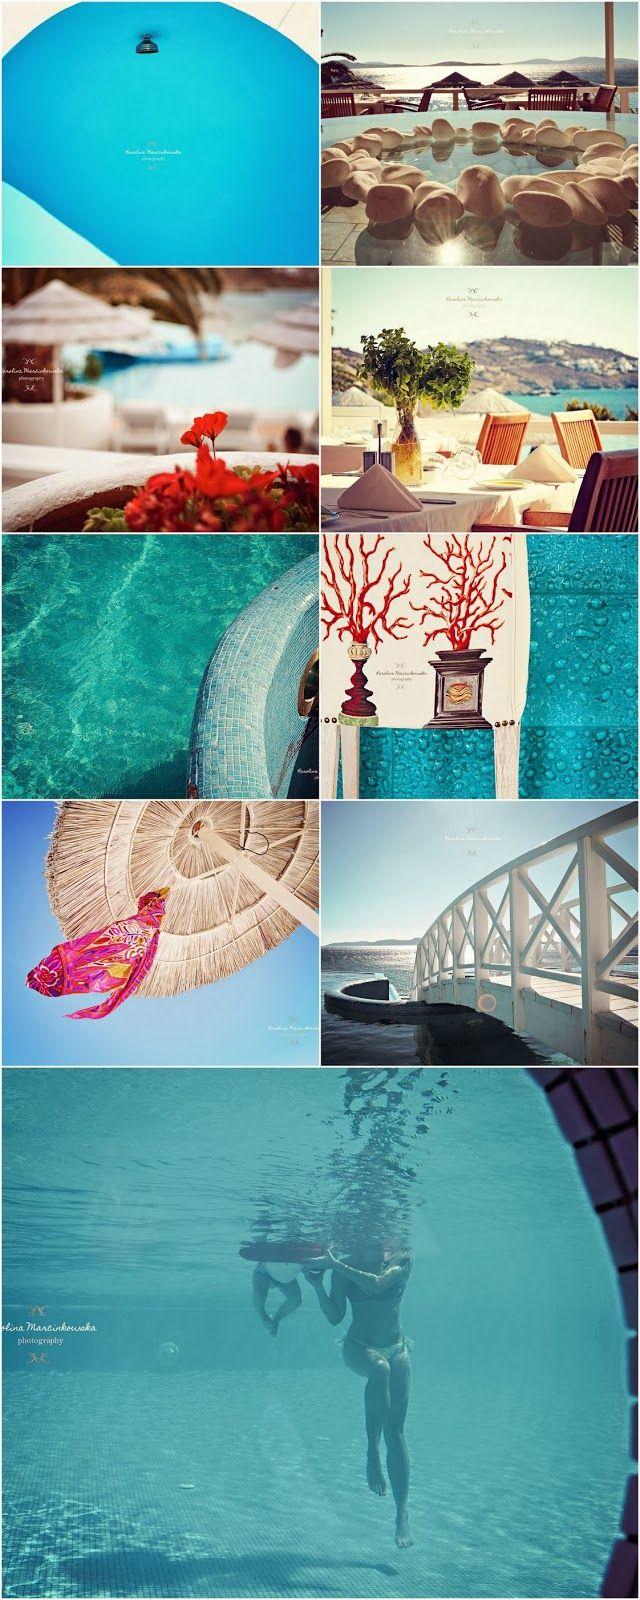 Blue Aqua - Greece, Mykonos, summer holidays and memories full of sun and sand!